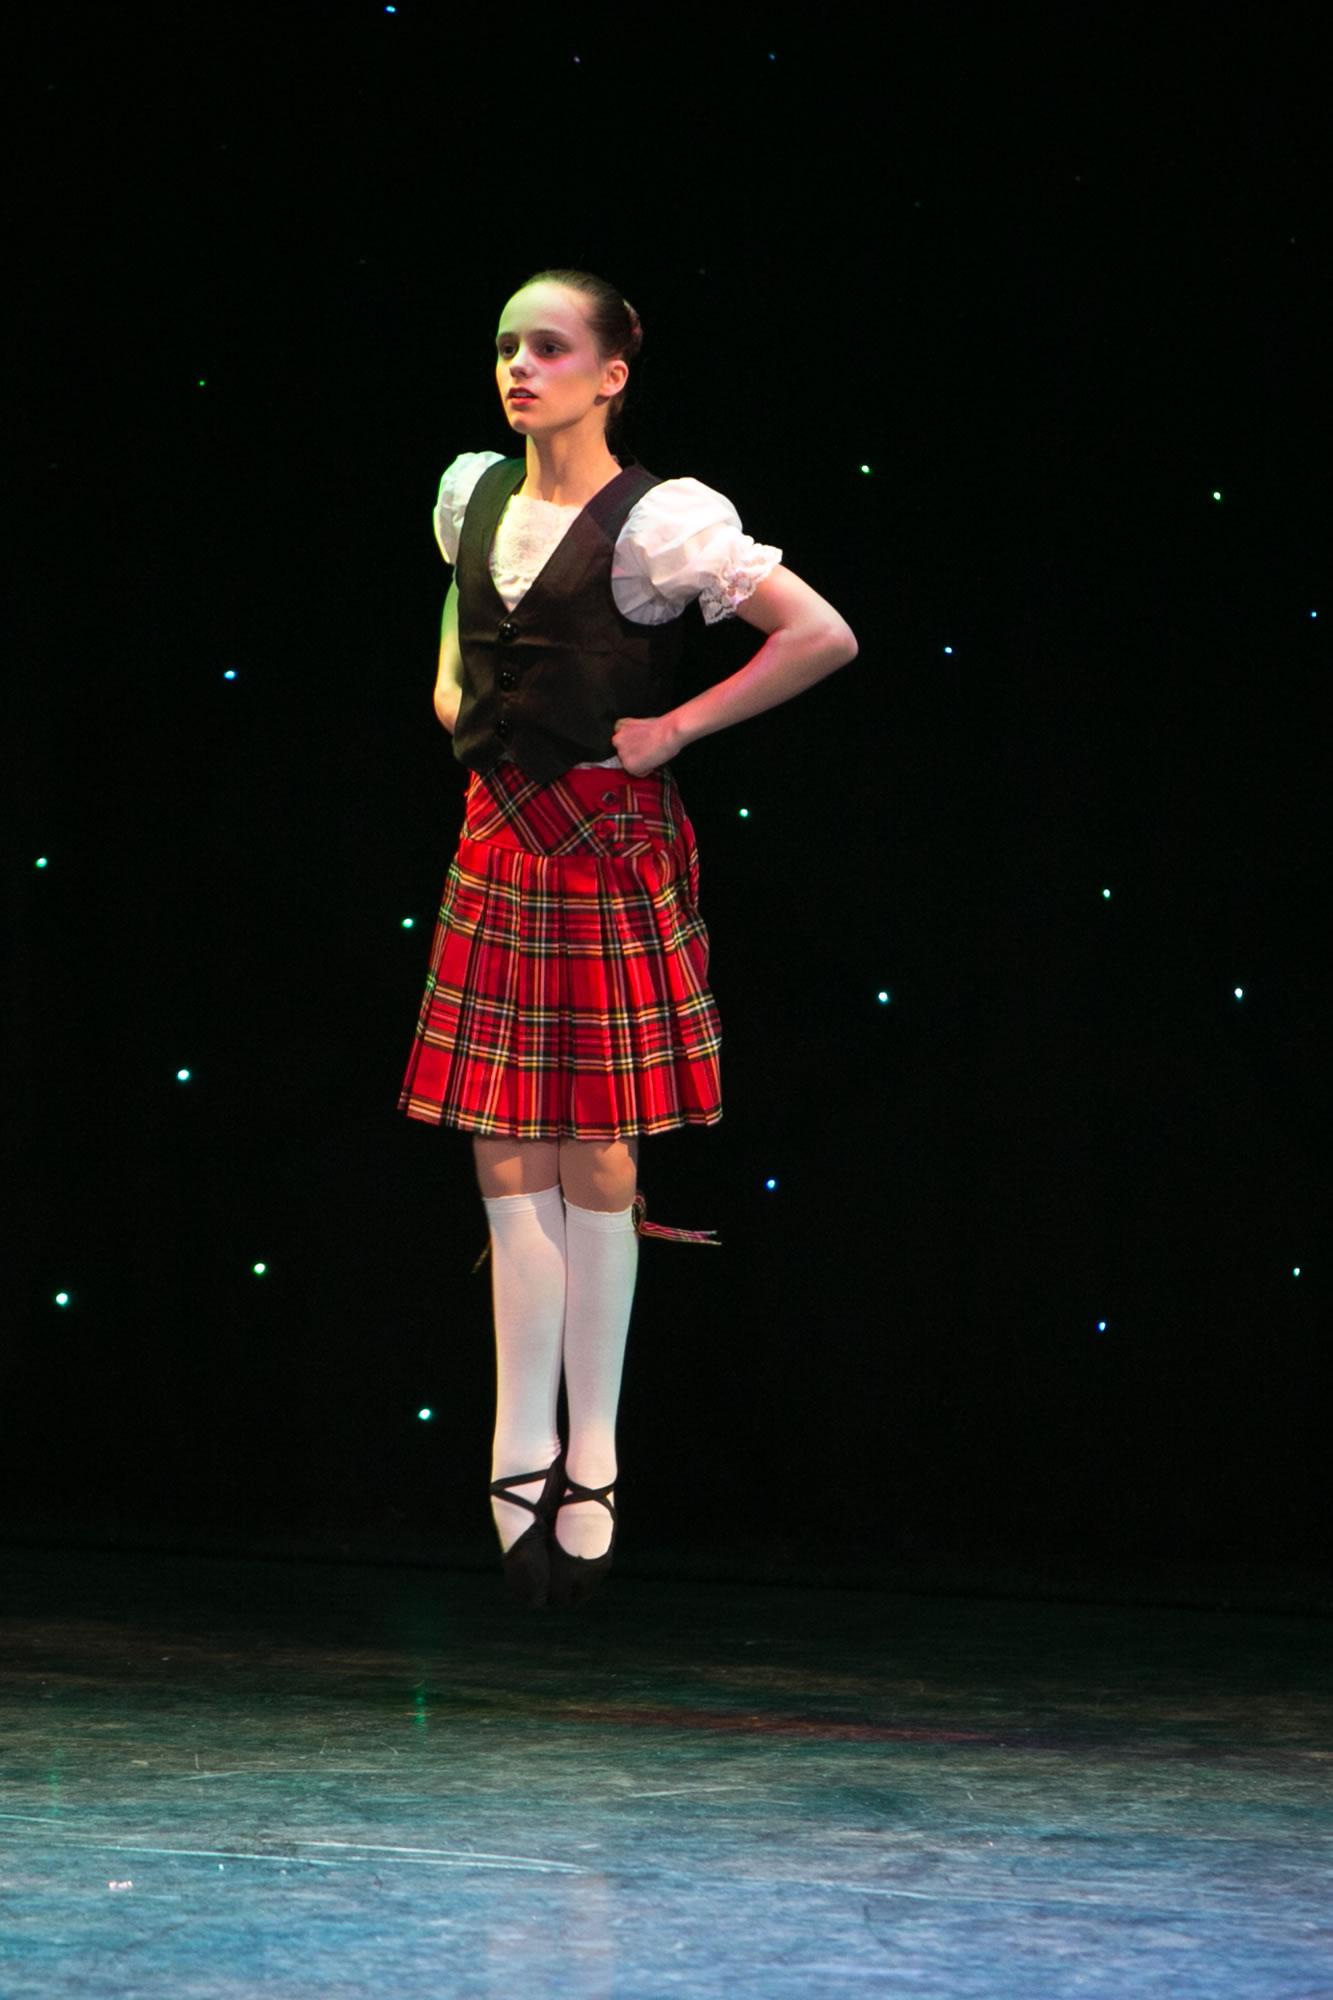 Hitchin_School_of_Dance_Show_2019-SM1_2299.jpg